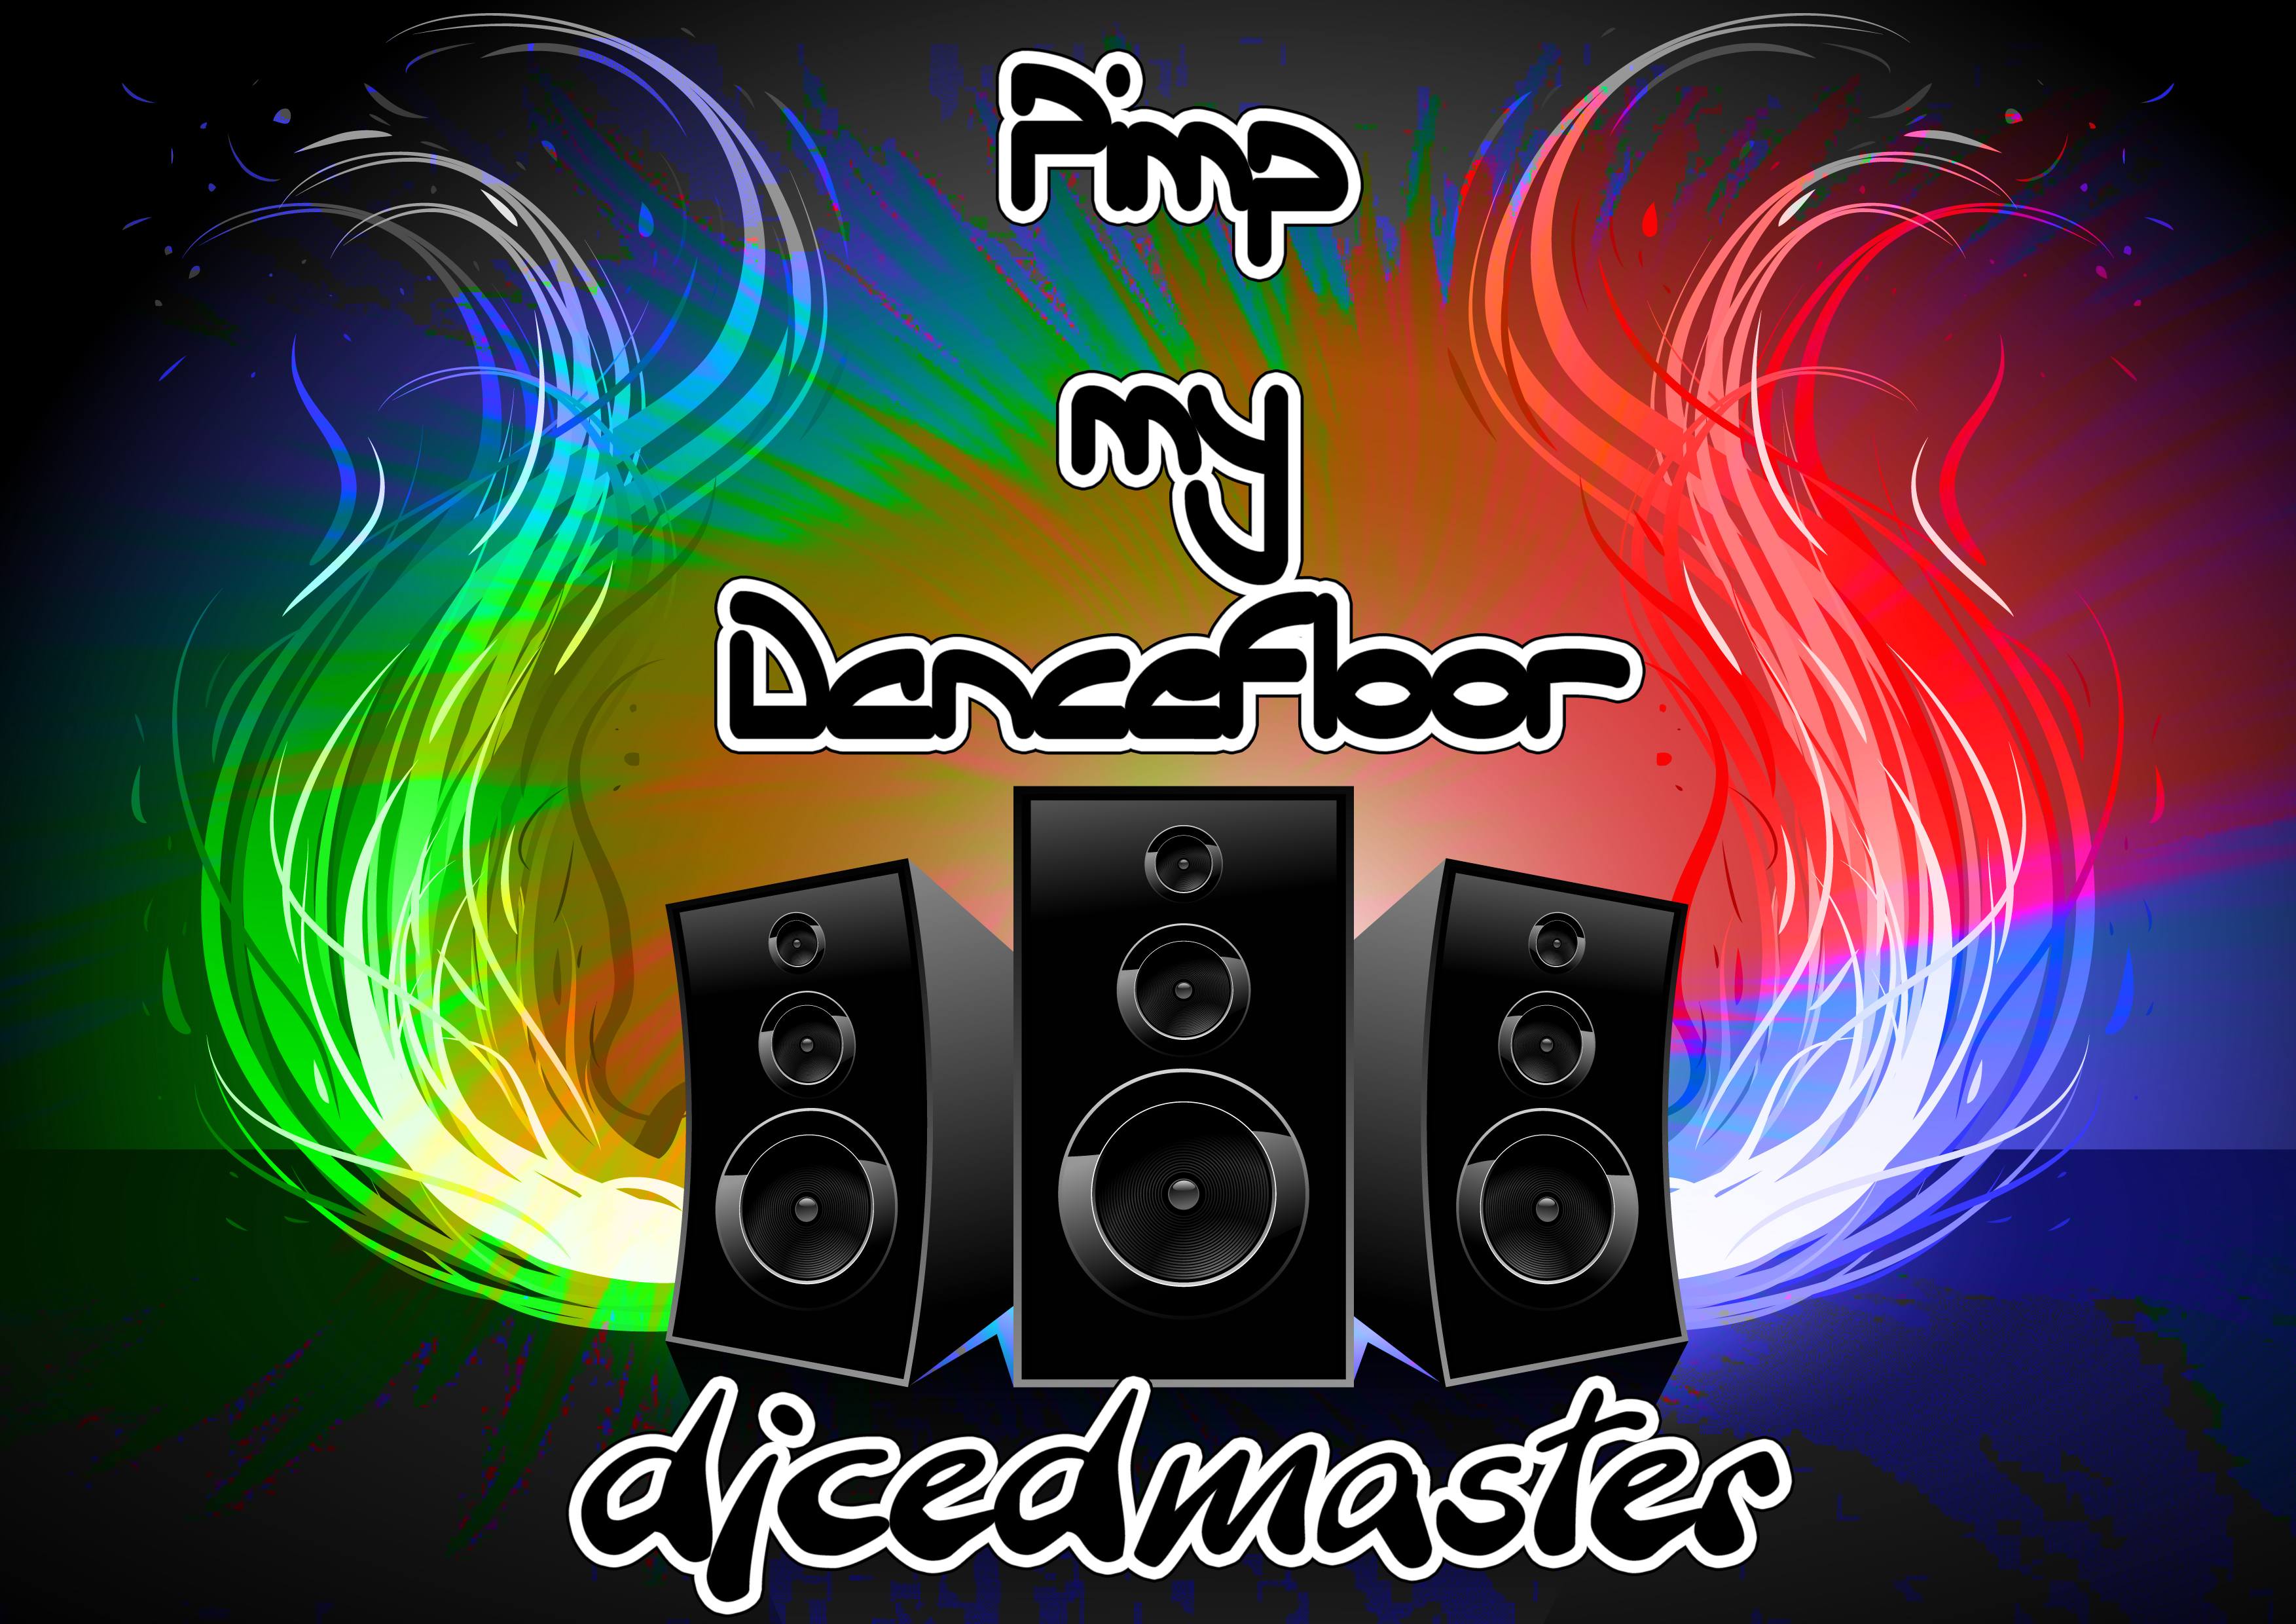 Djcedmaster sound for 1234 get on the dance floor dj mix